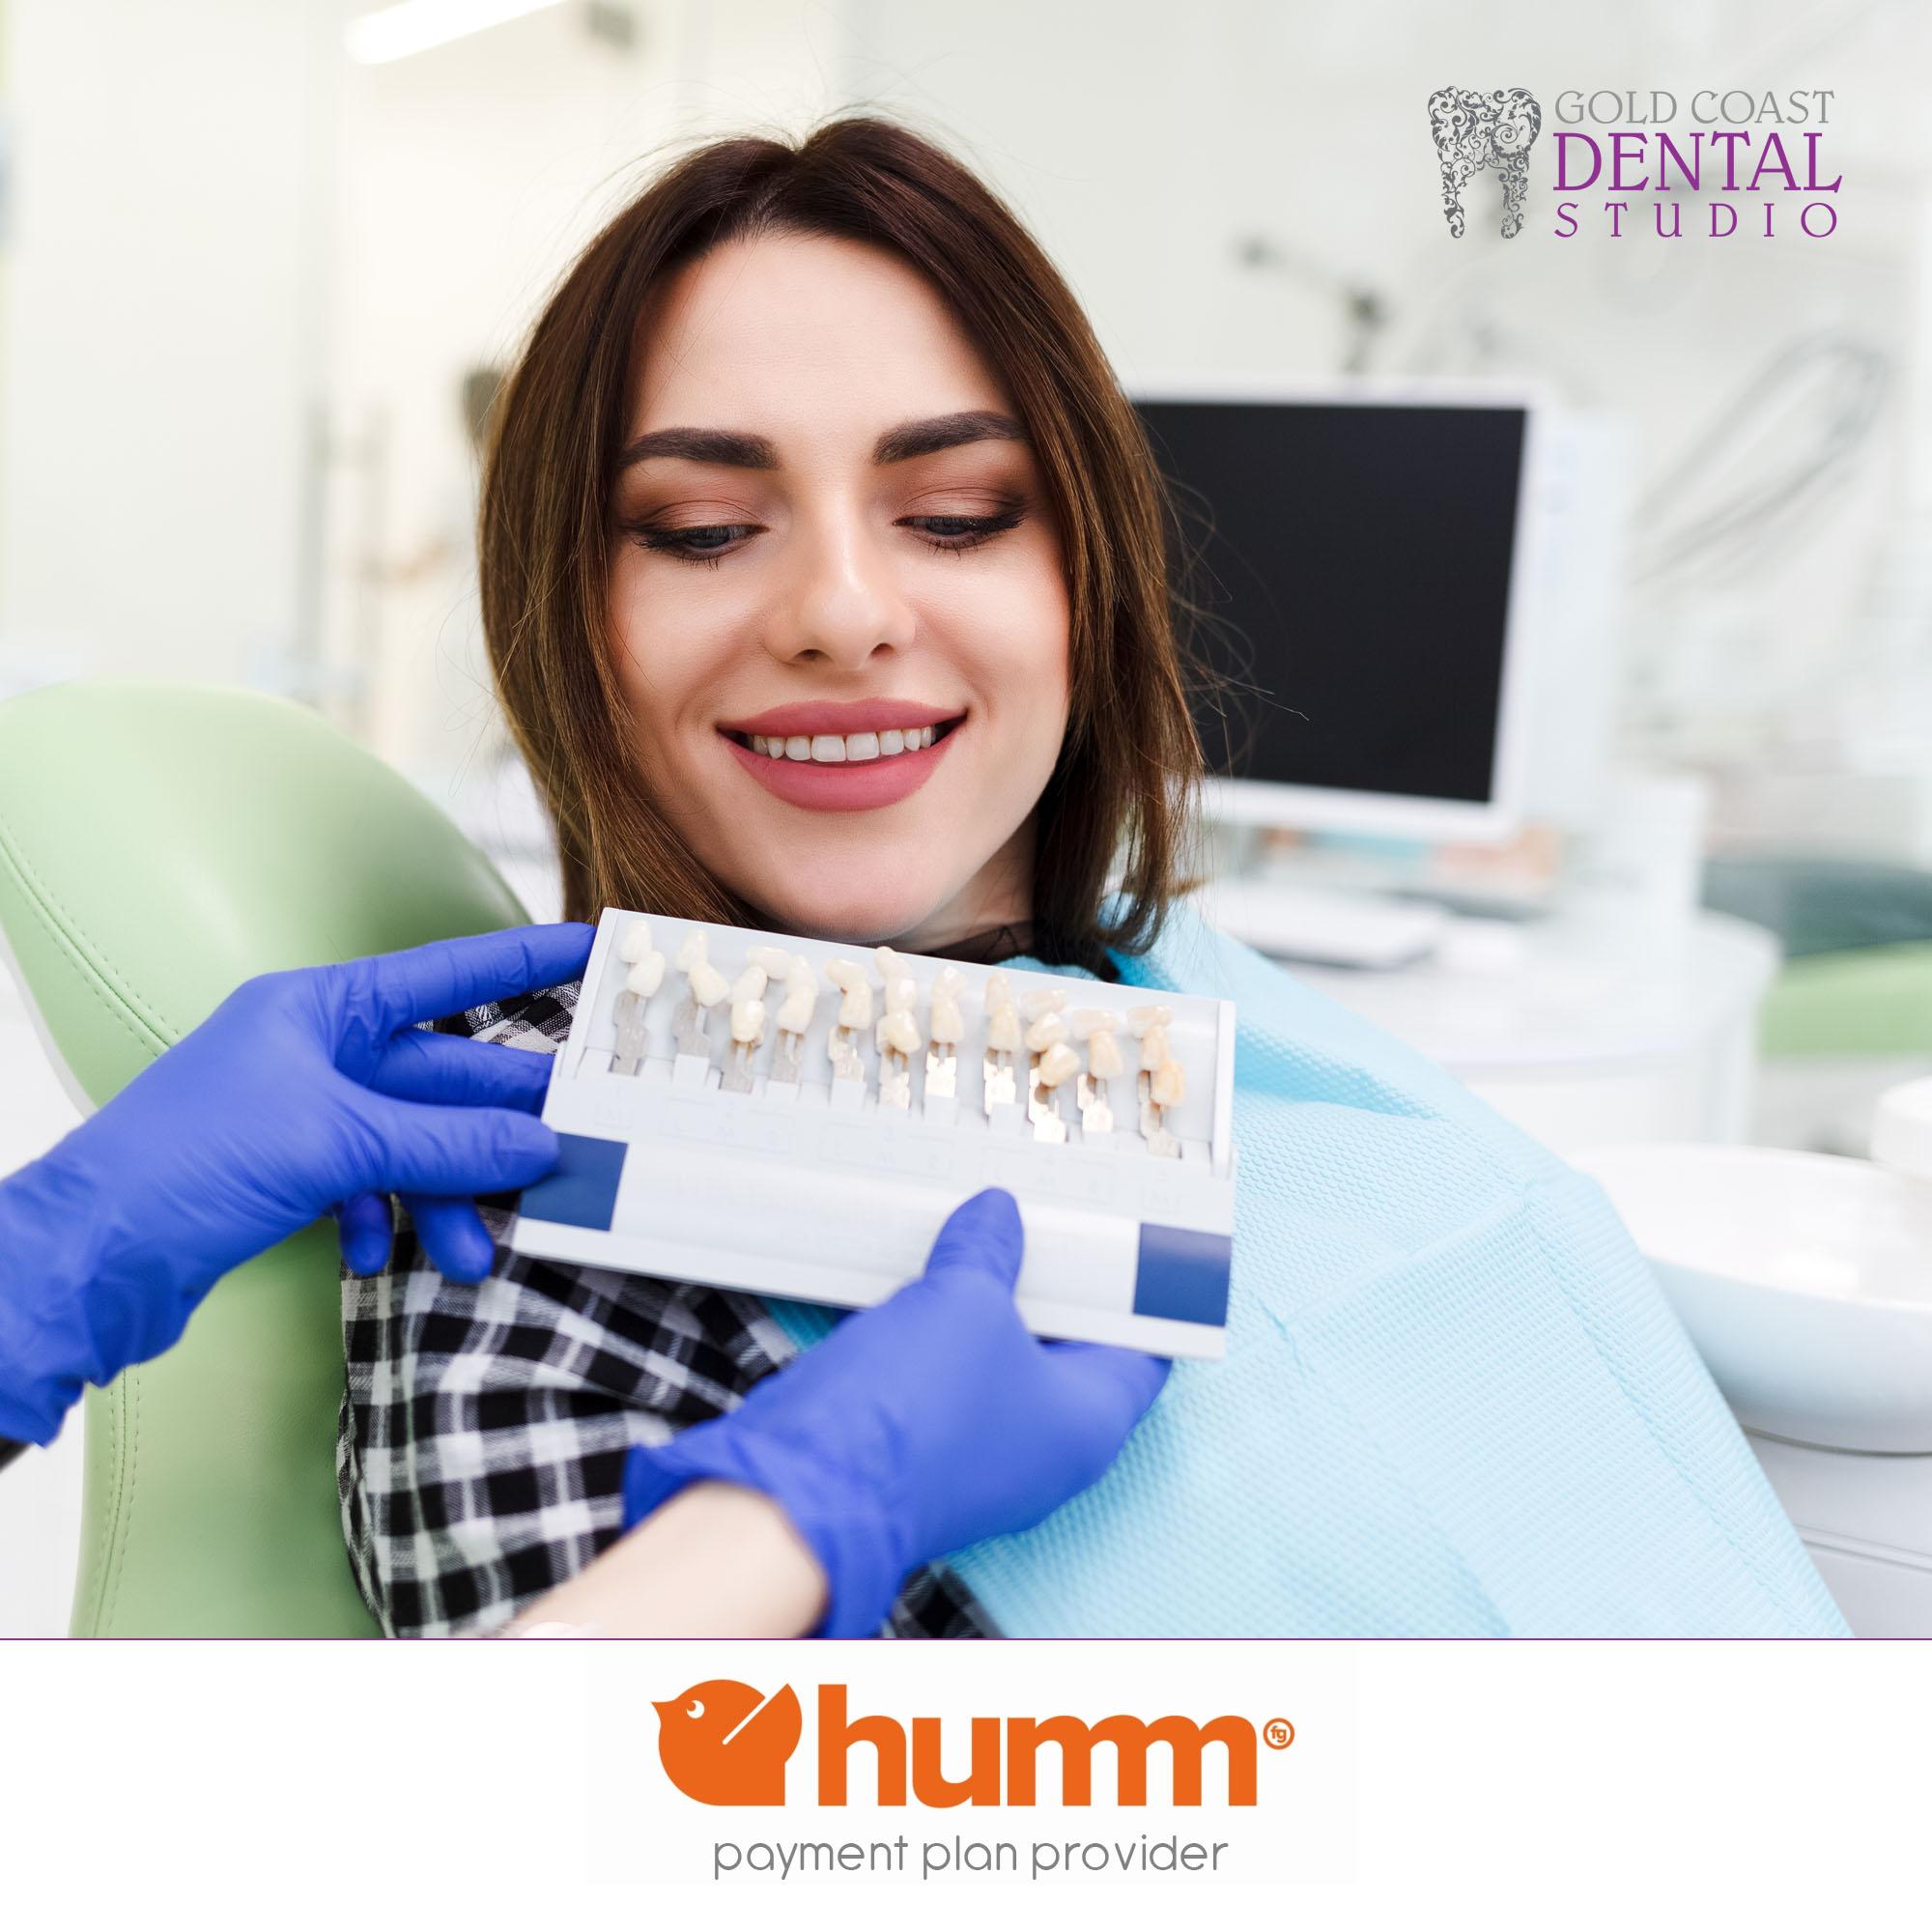 Humm now available at Gold Coast Dental Studio